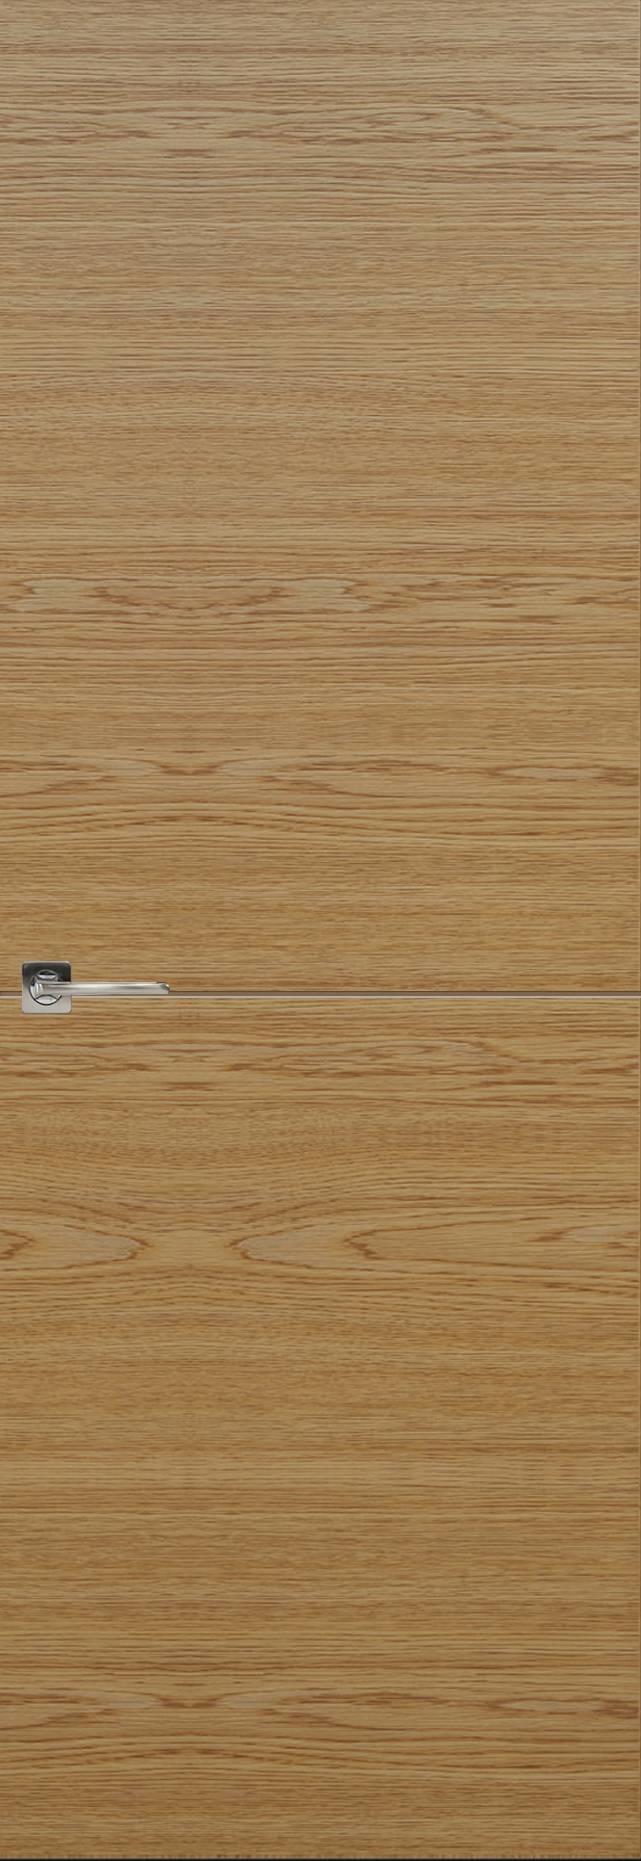 Tivoli Б-2 невидимка цвет - Дуб карамель Без стекла (ДГ)